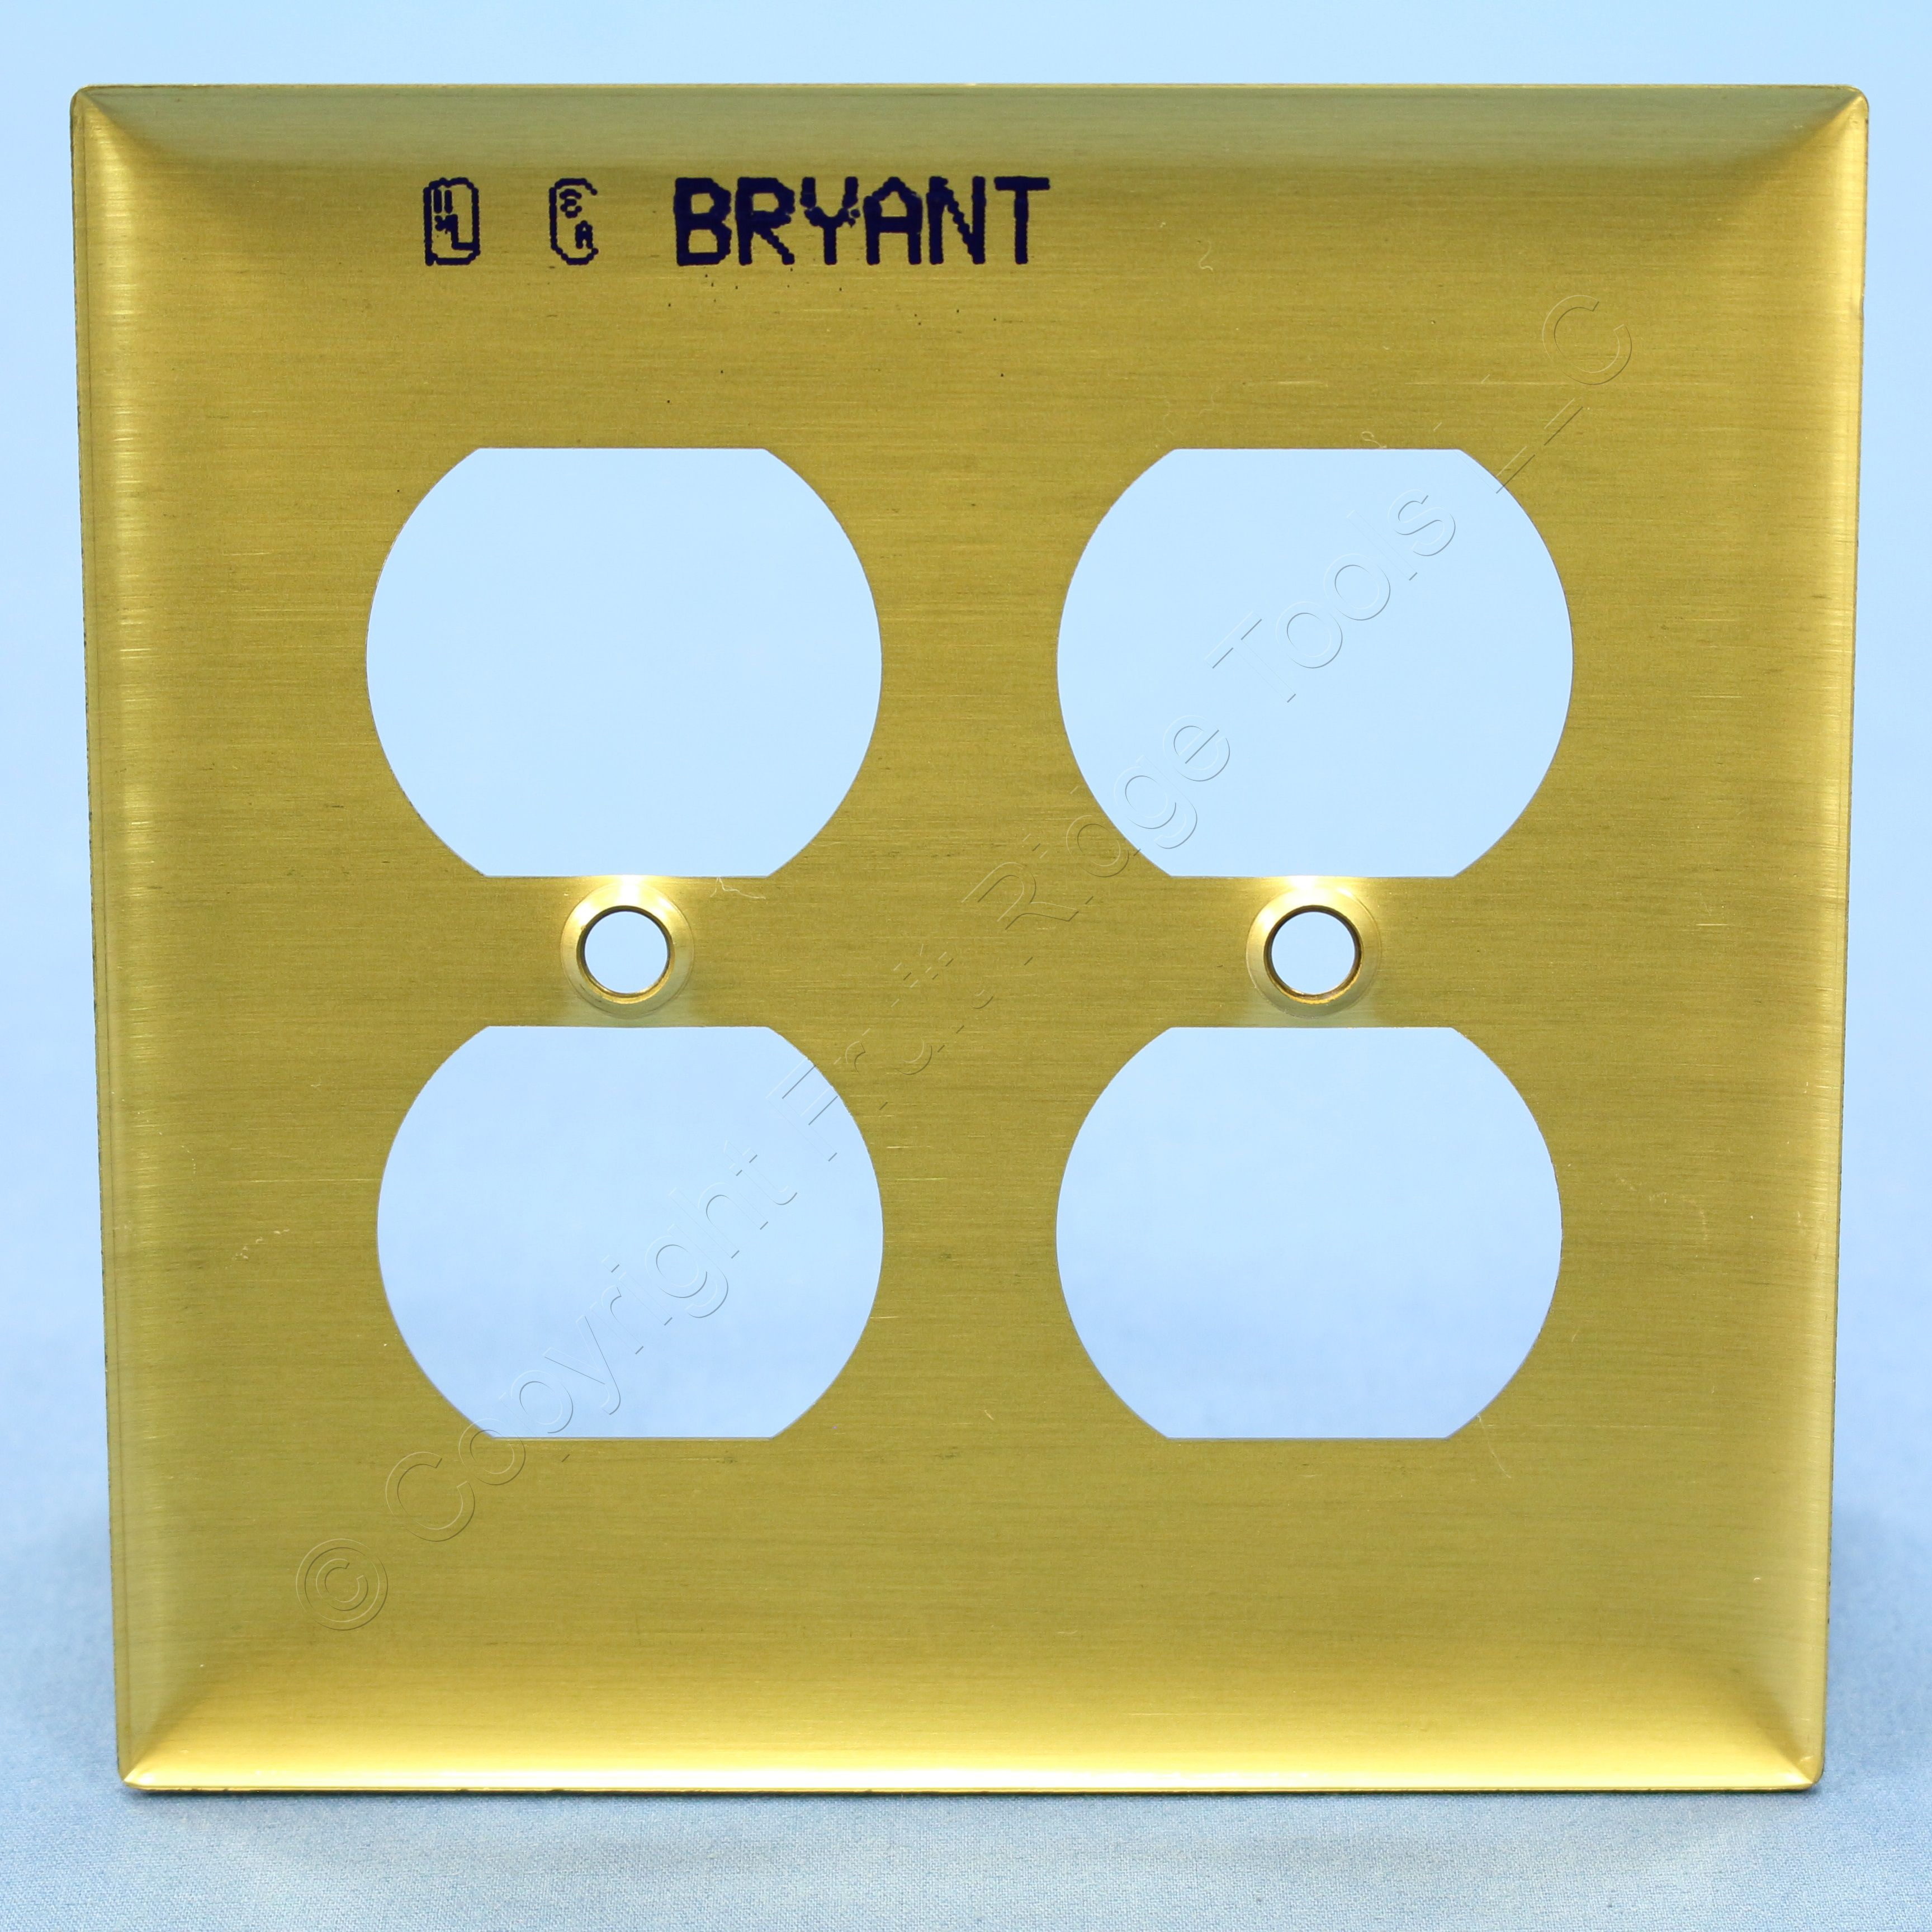 Duplex Receptacle Wall Plate Hubbell Wiring Device-kellems SB82 | eBay